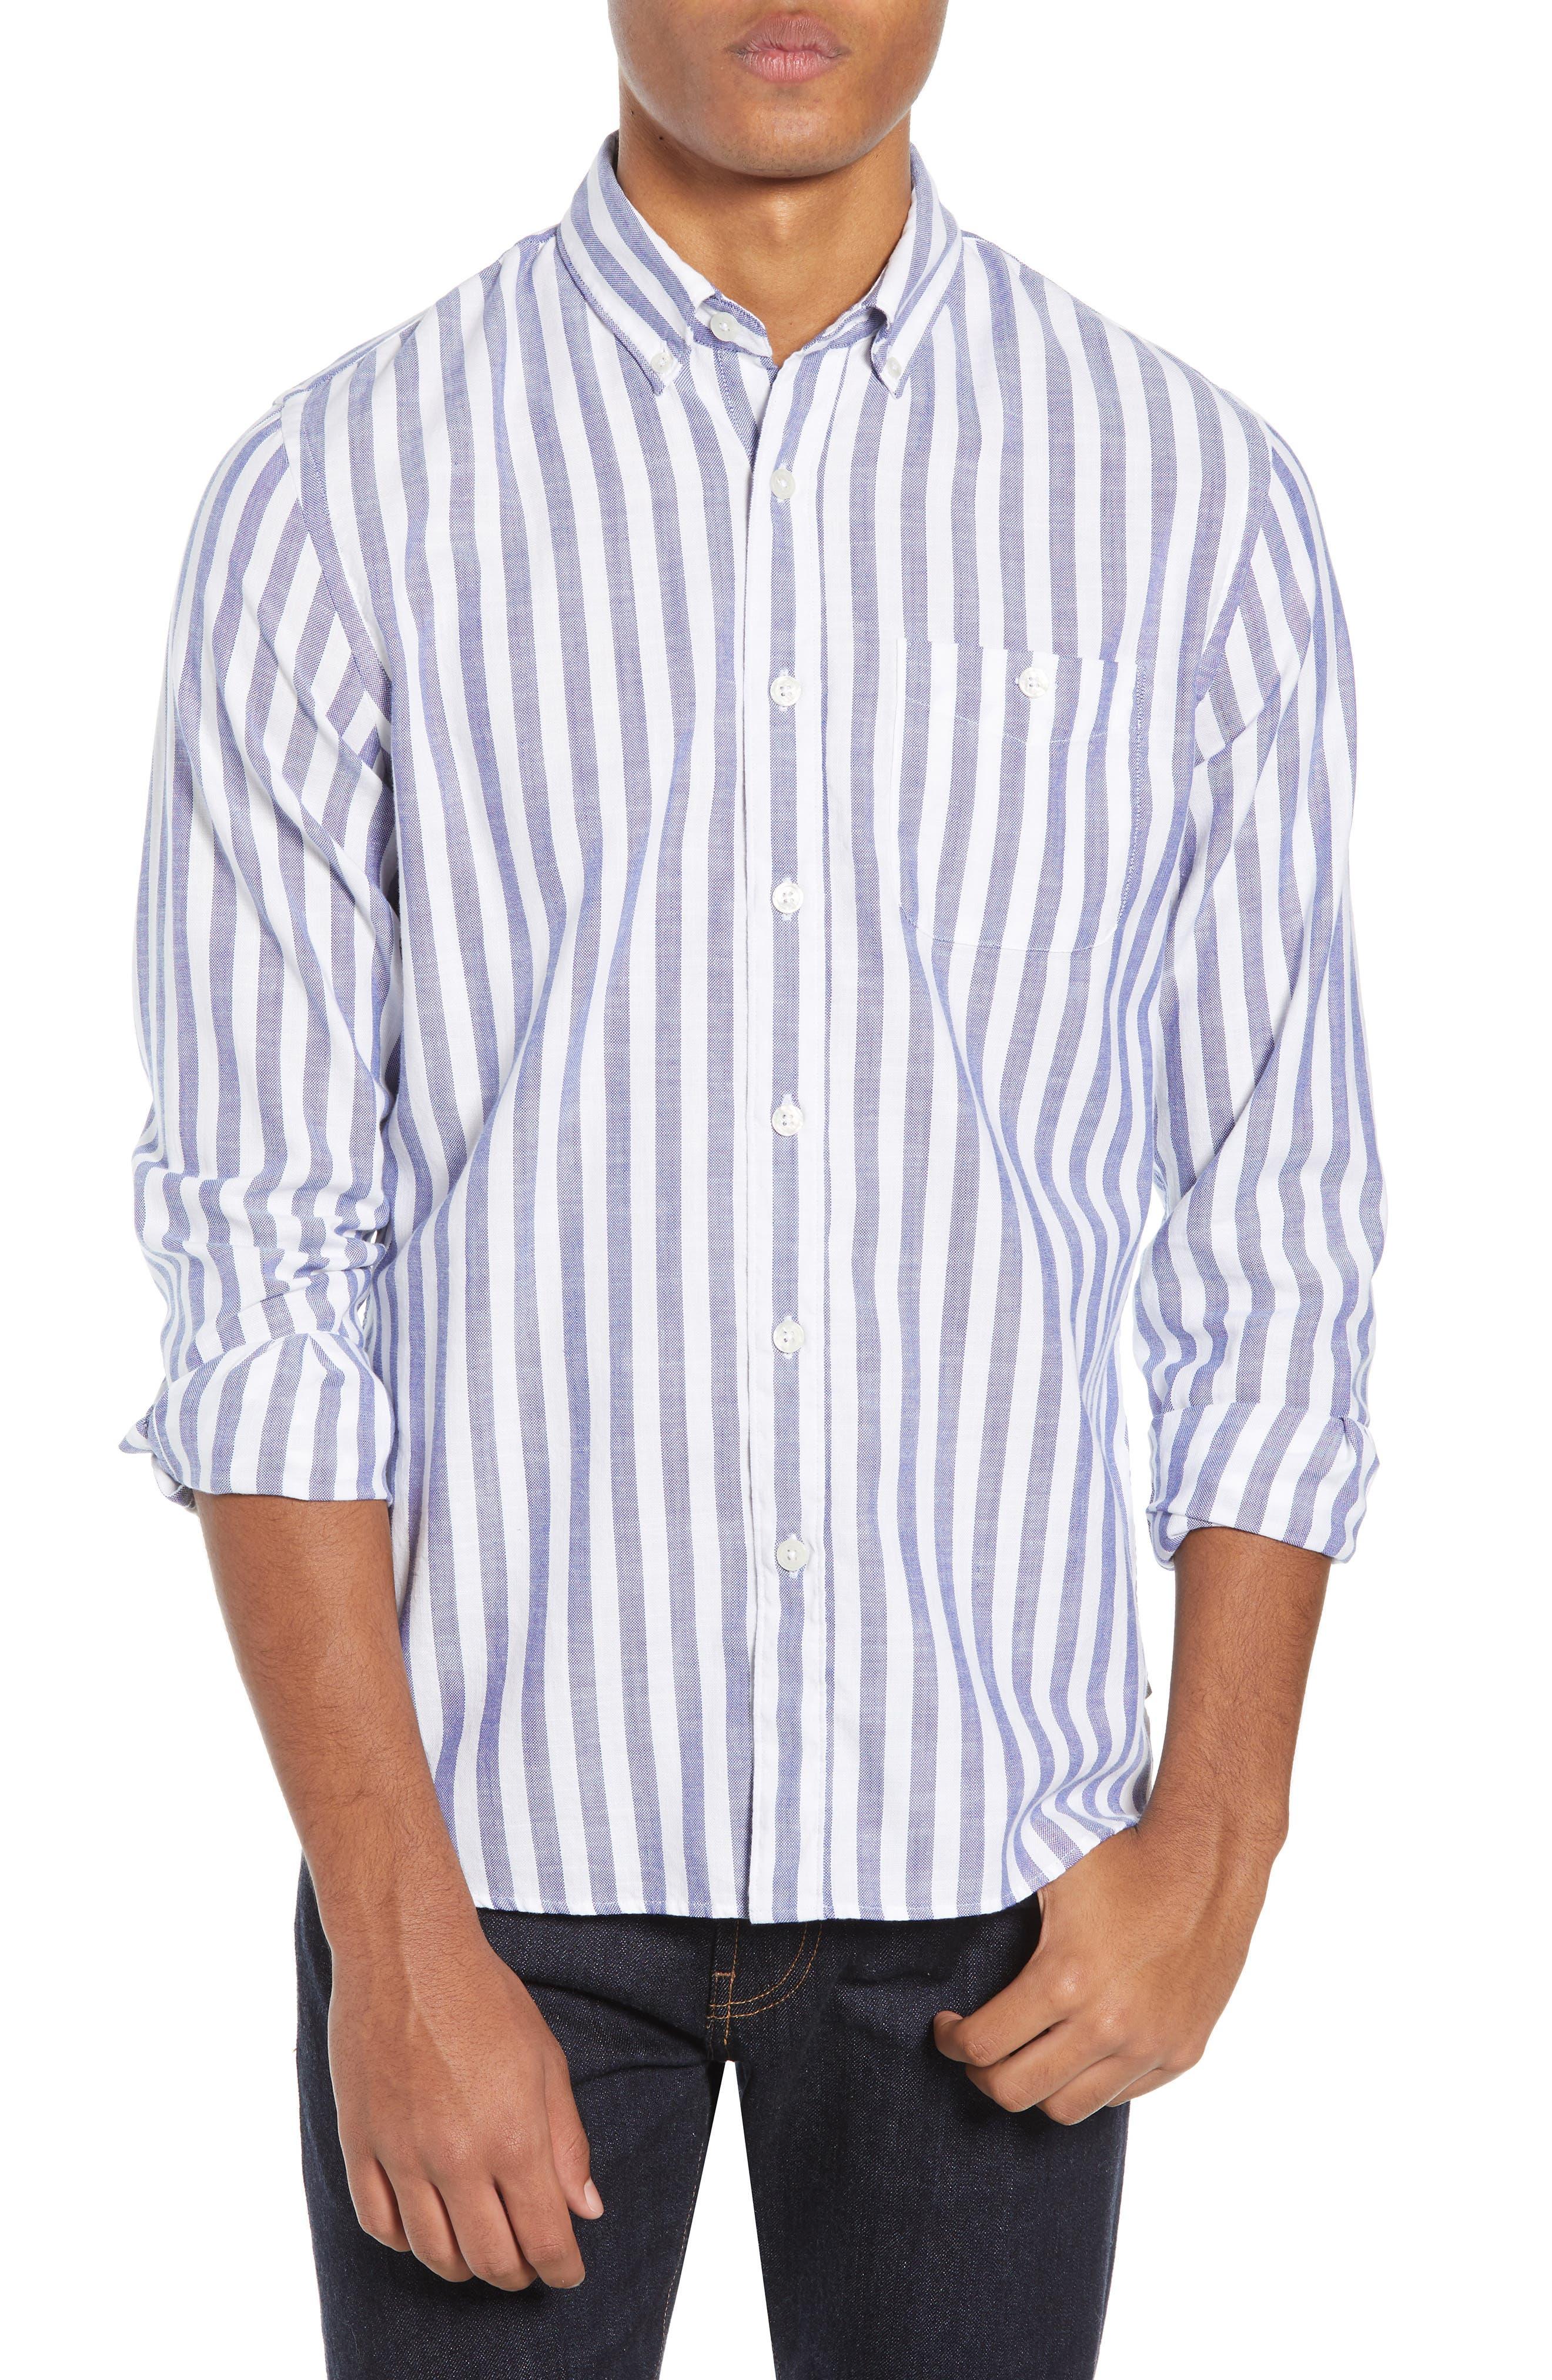 TODD SNYDER Regular Fit Stripe Oxford Sport Shirt in Blue